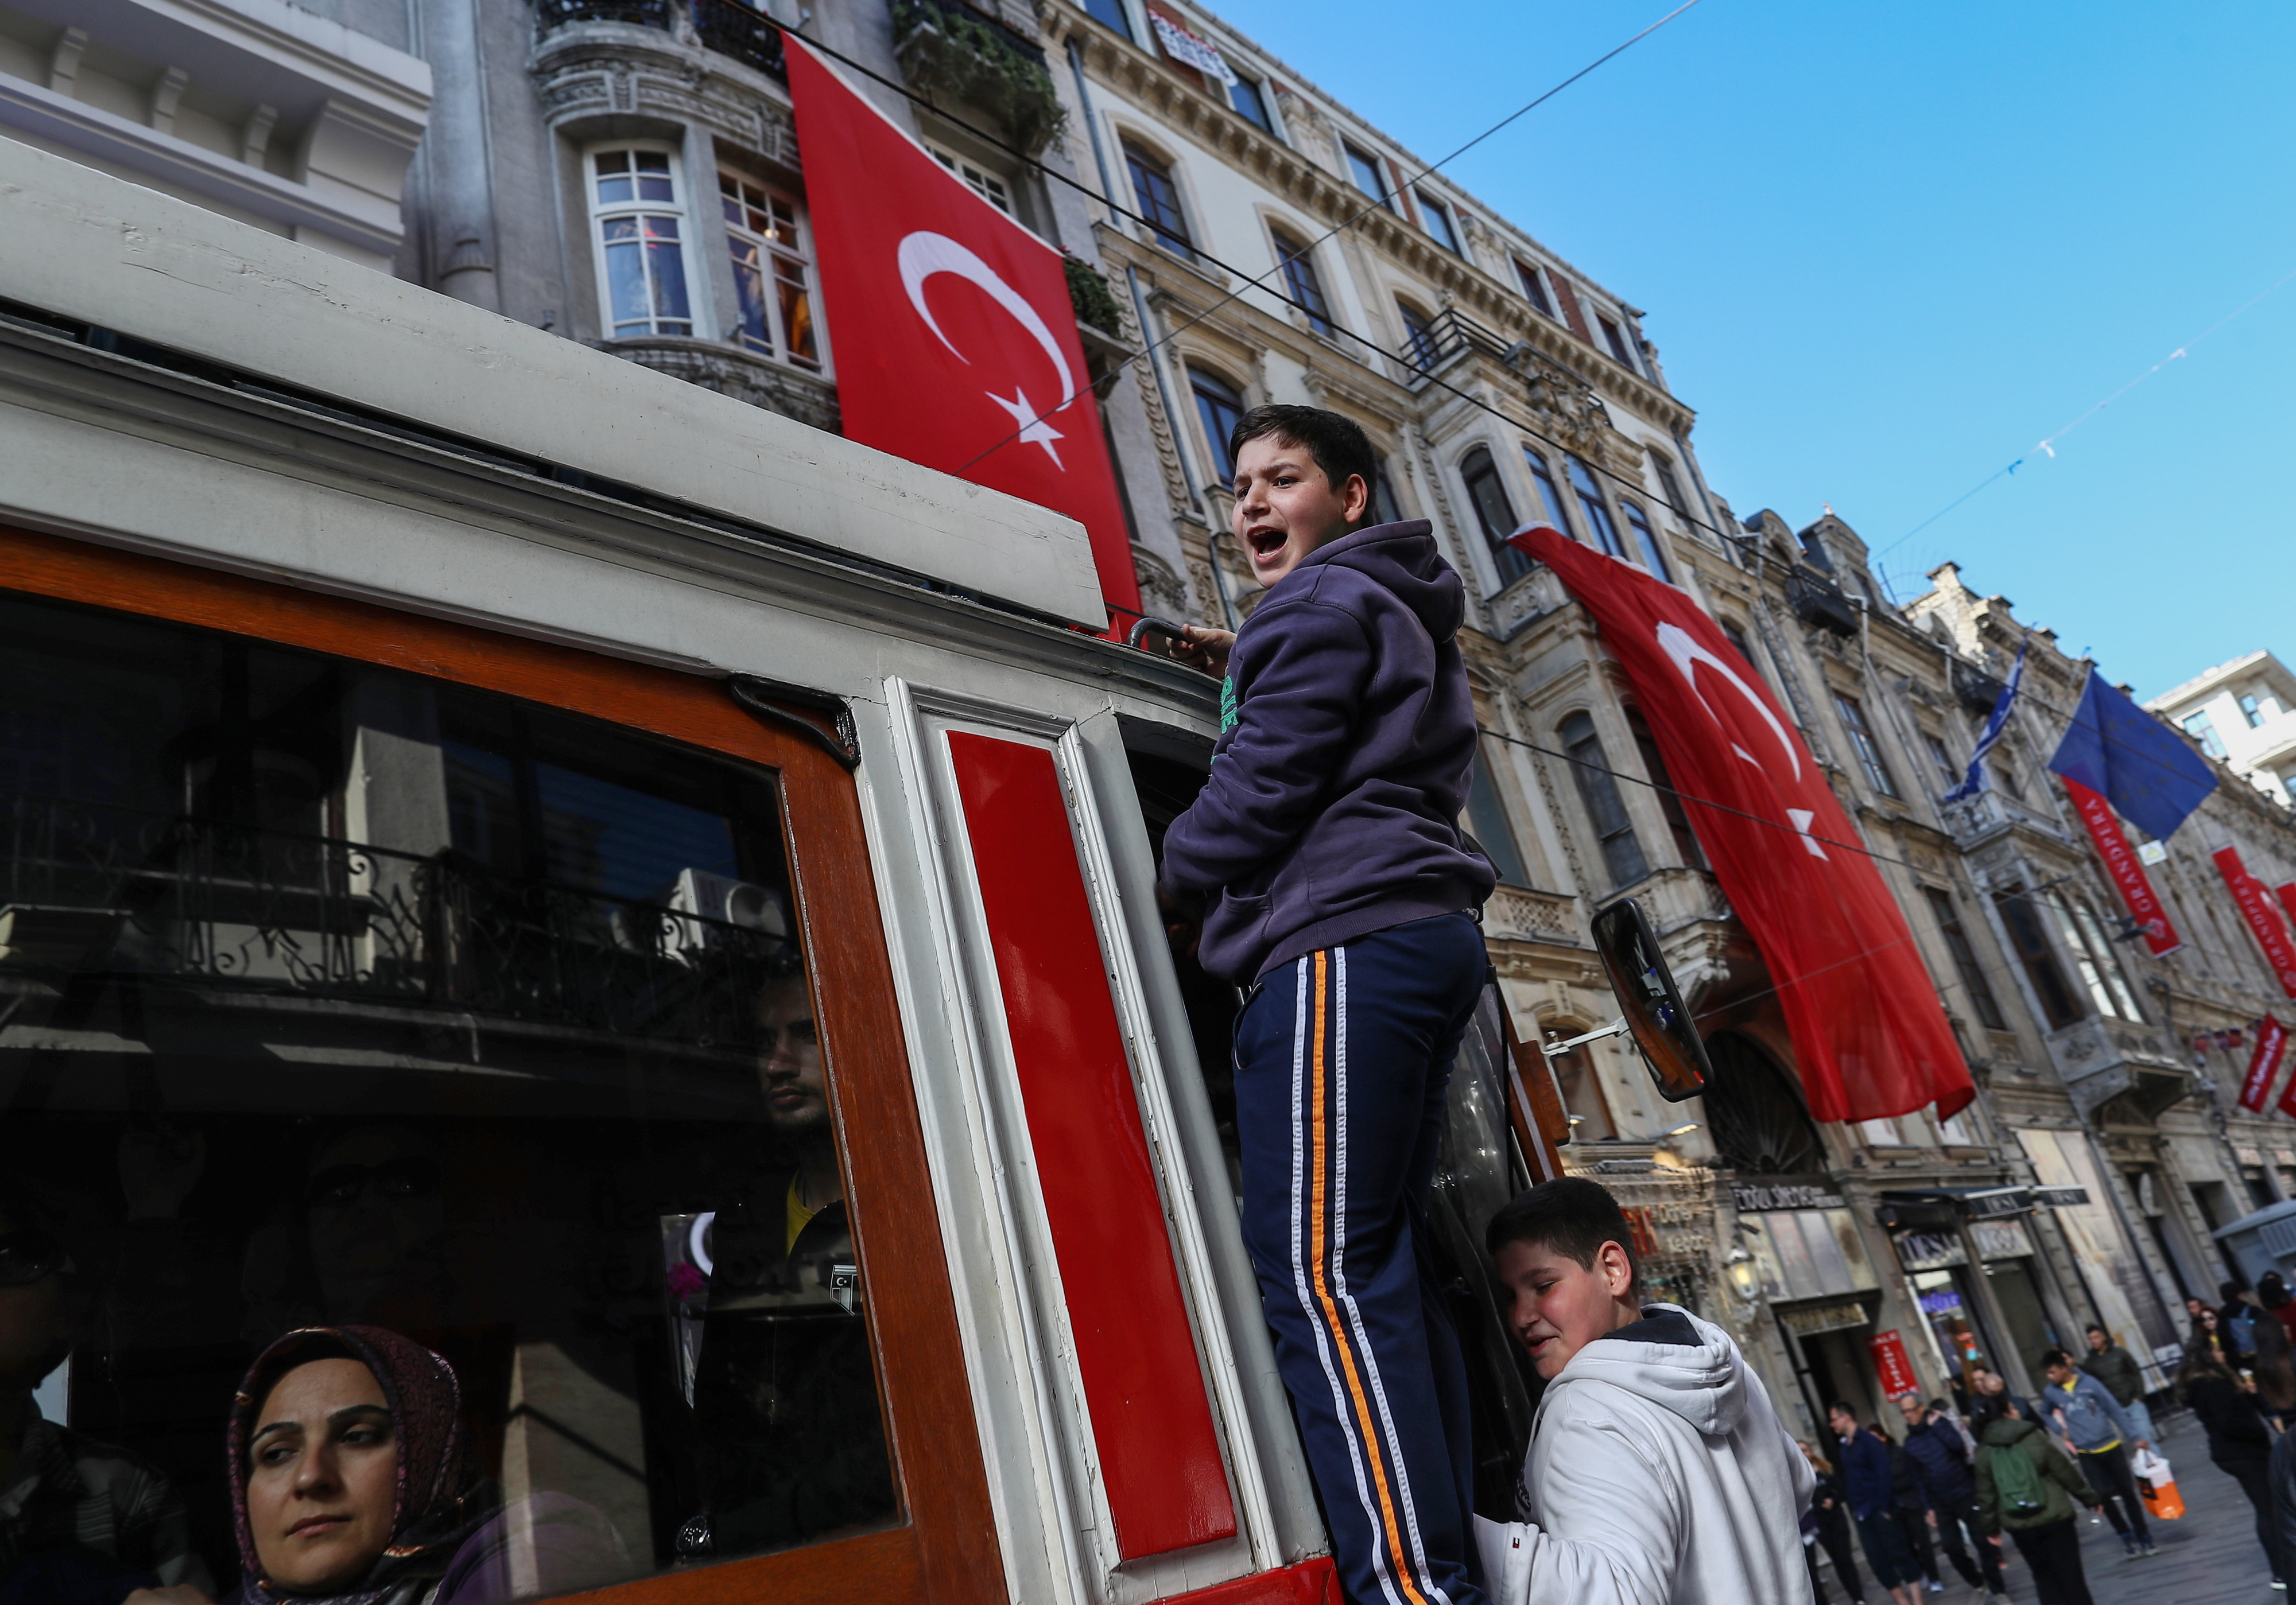 Democracia vai chegar à Turquia - realizador curdo Zirek